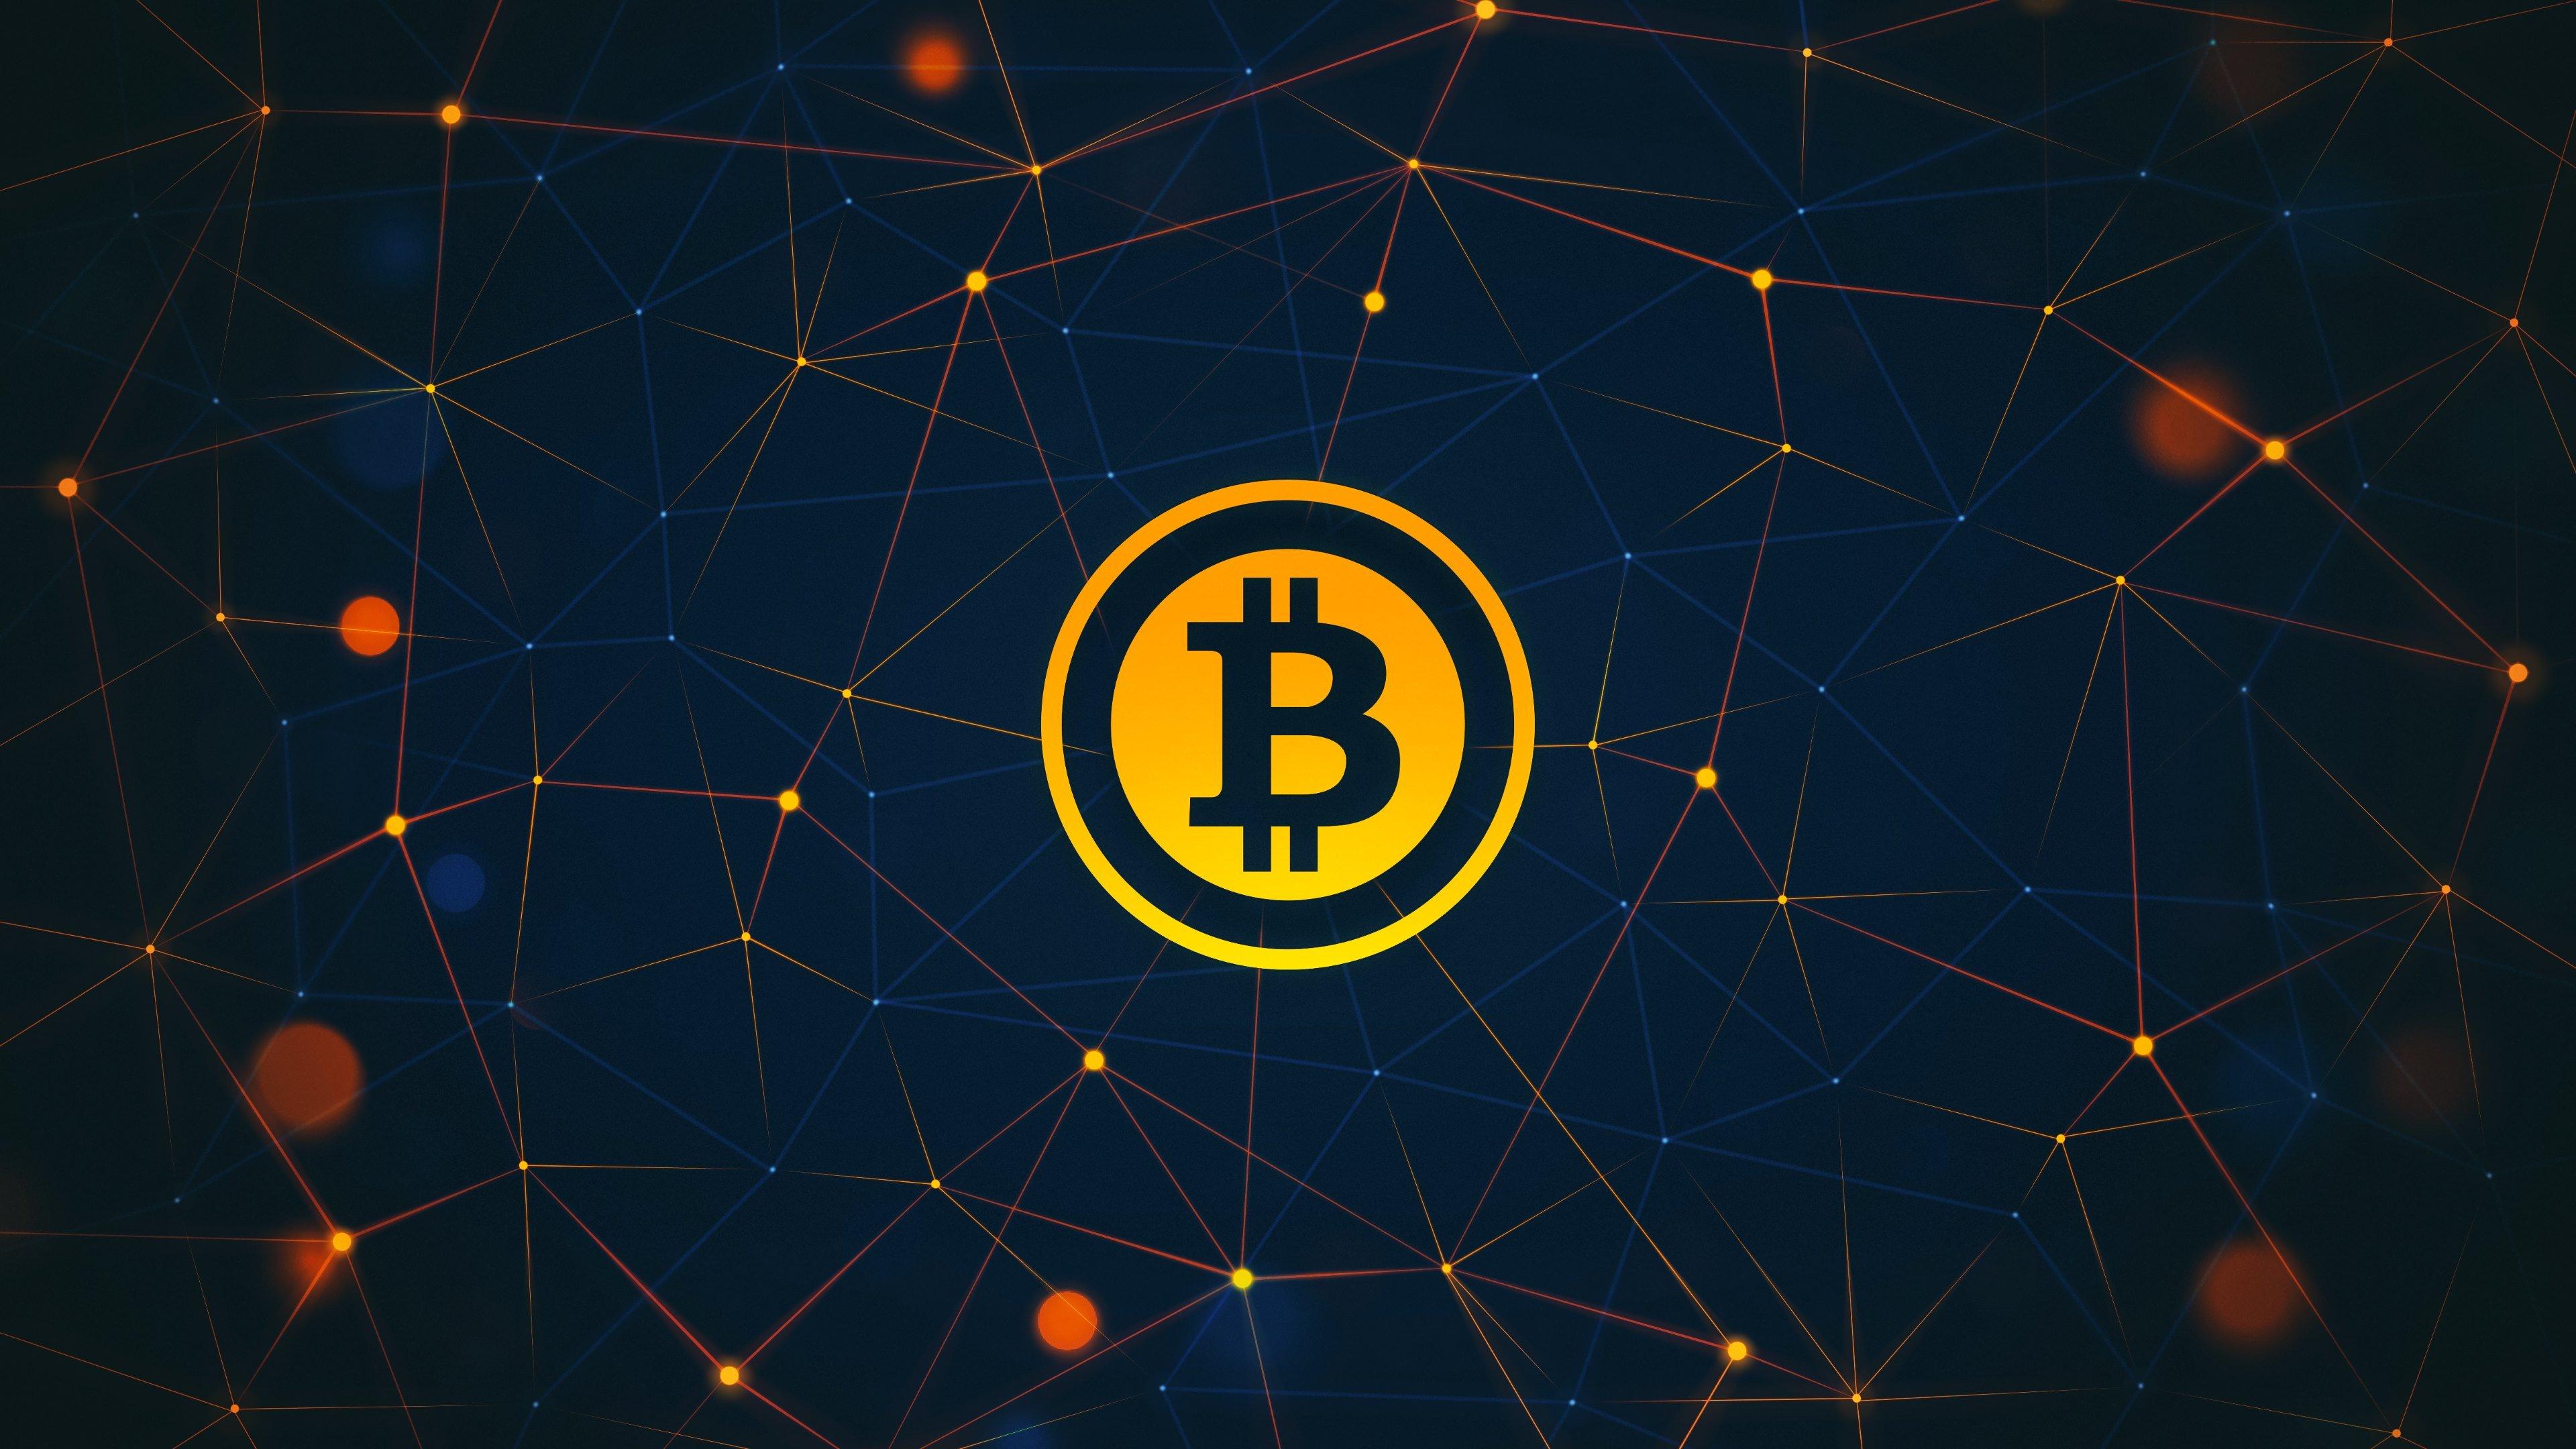 Abstract Bitcoin Widescreen Wallpaper 62344 3840x2160px 3840x2160